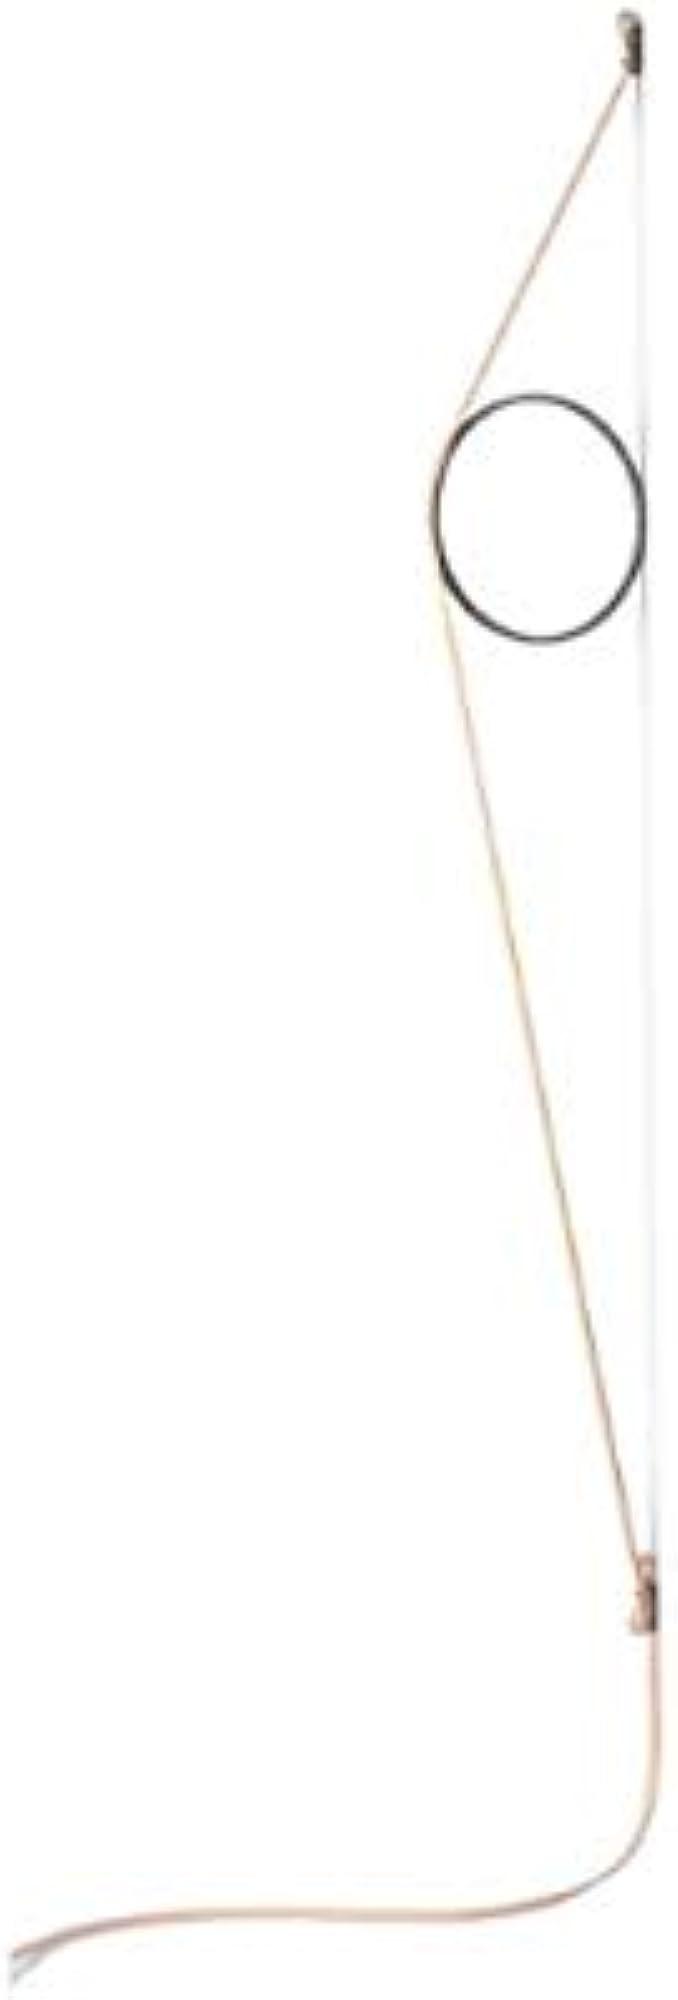 Flos wirering lampada da parete led apparecchio di illuminazione a parete a luce indiretta F9512044